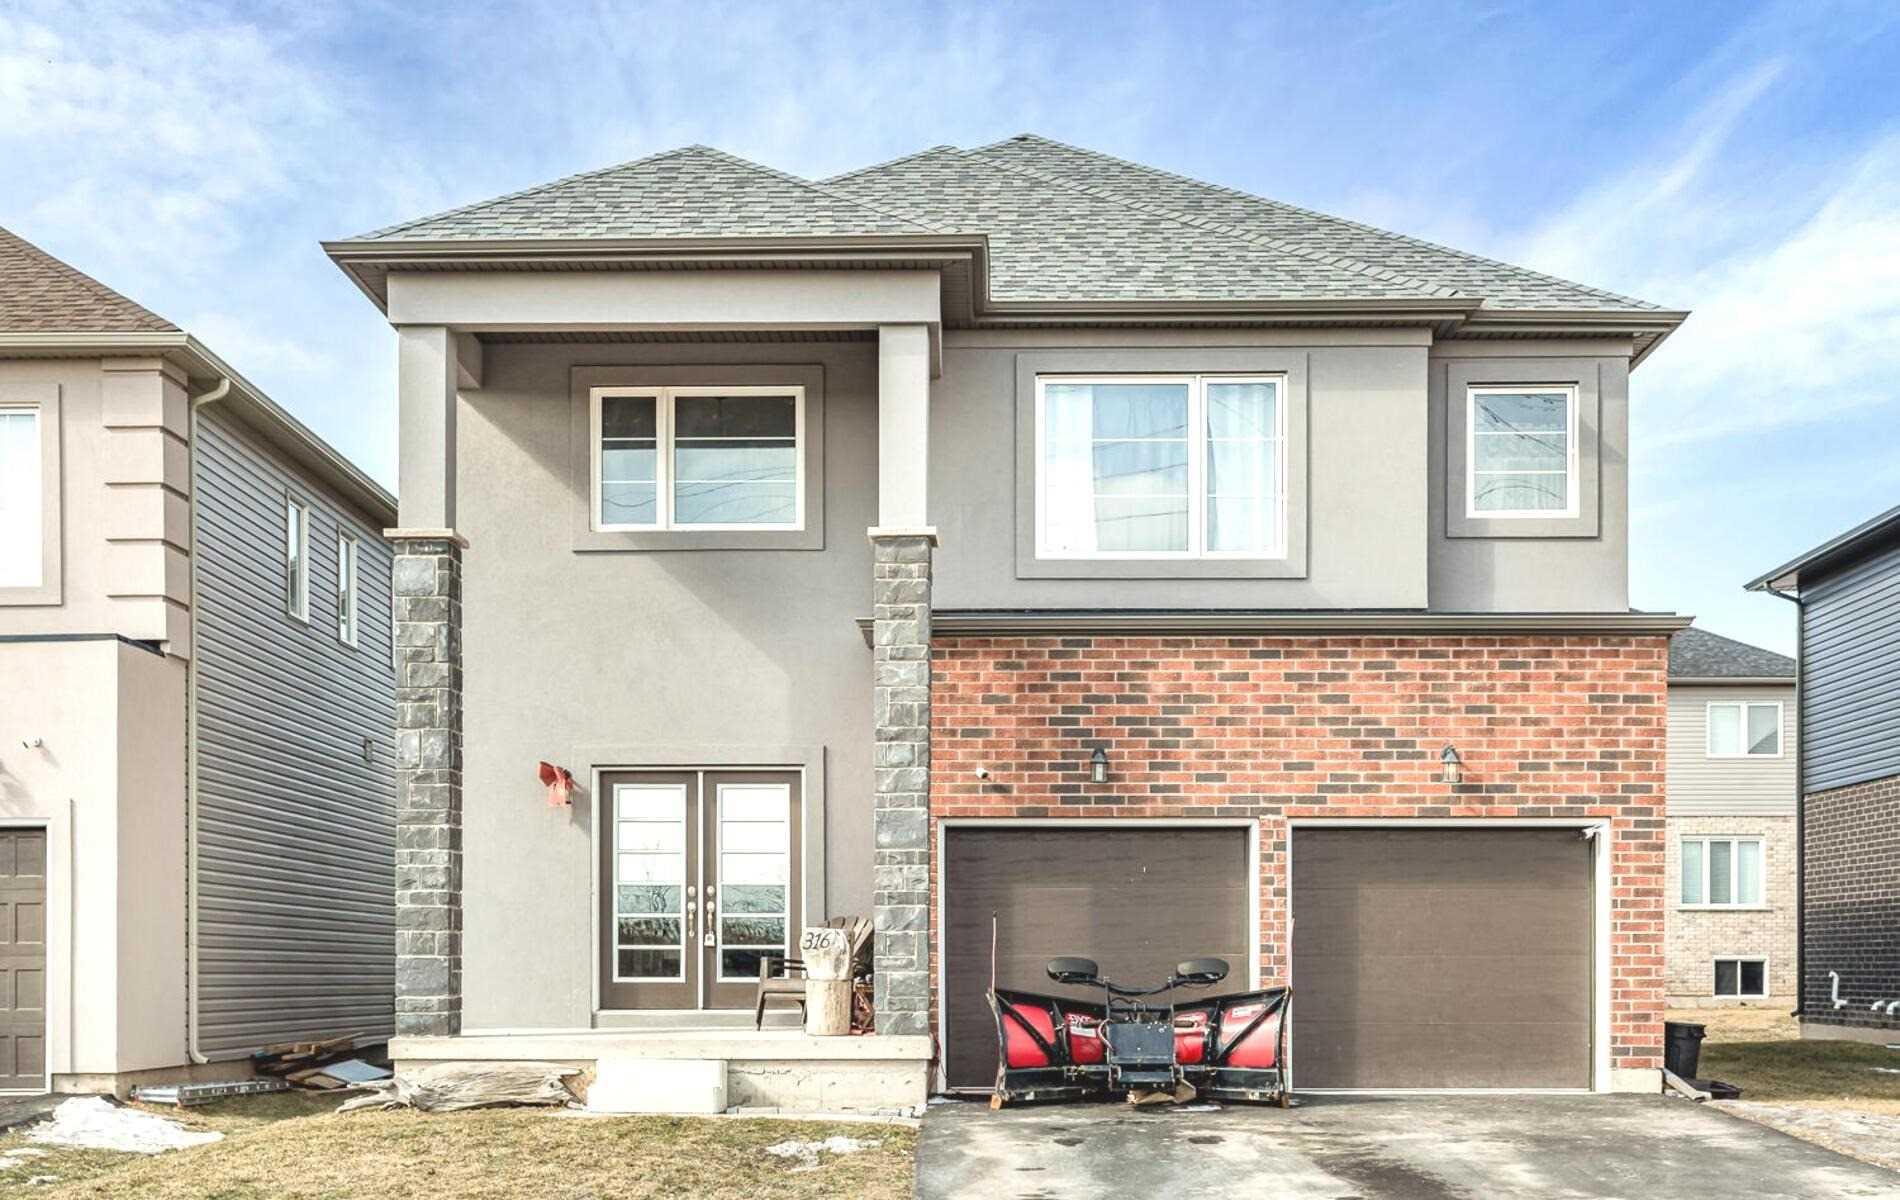 316 Bradley Ave, Welland, Ontario L3B 5T8, 4 Bedrooms Bedrooms, ,4 BathroomsBathrooms,Detached,For Sale,Bradley,X5138685